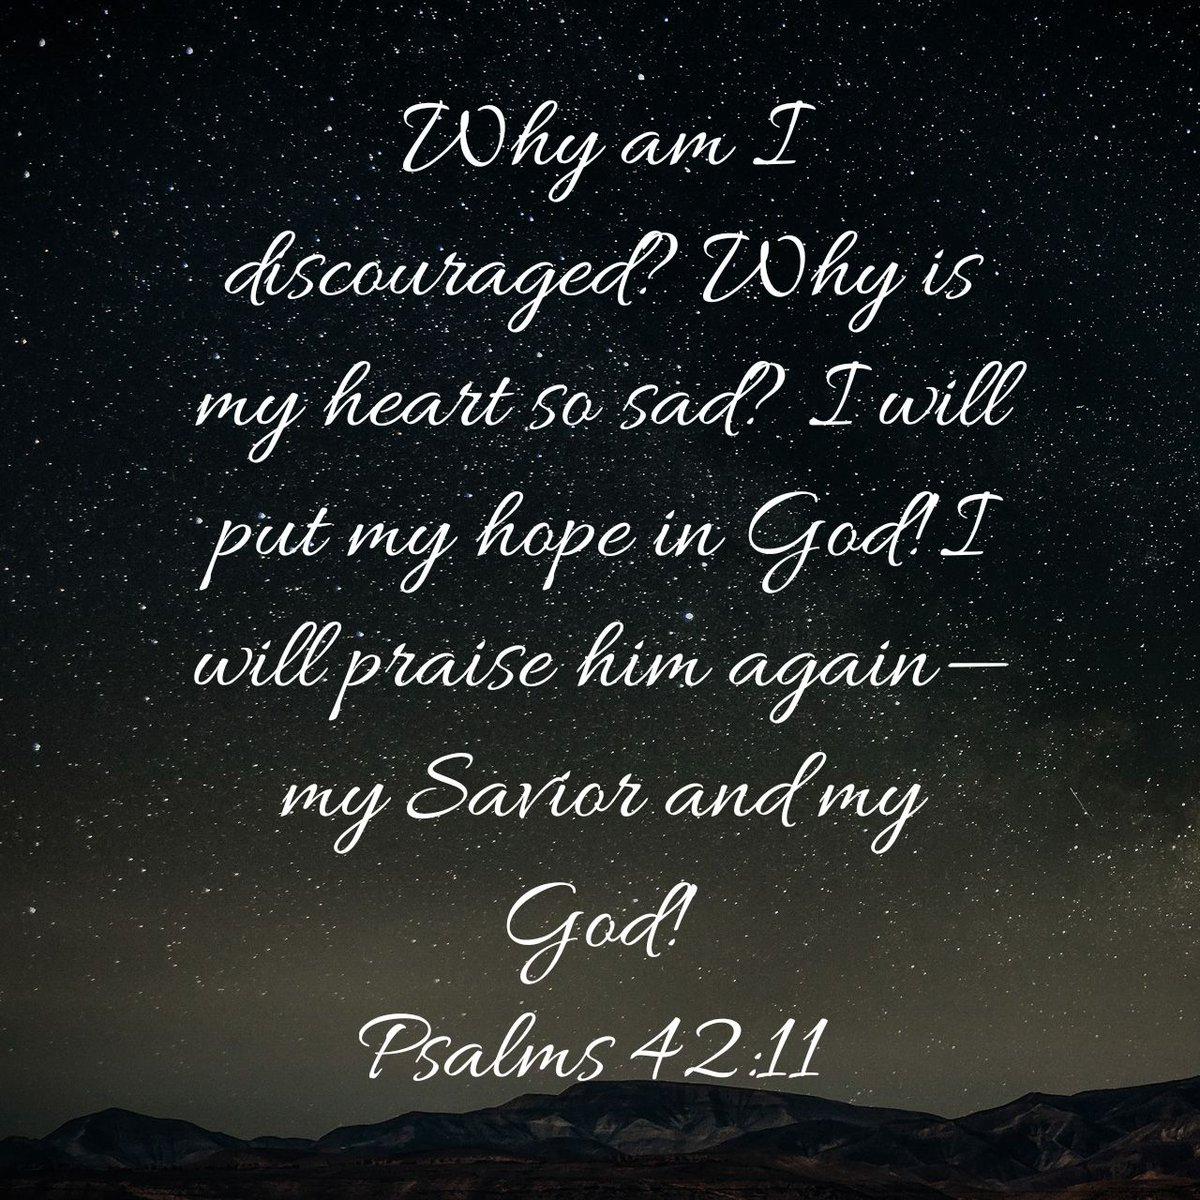 Heart sad my is 5 Psalms